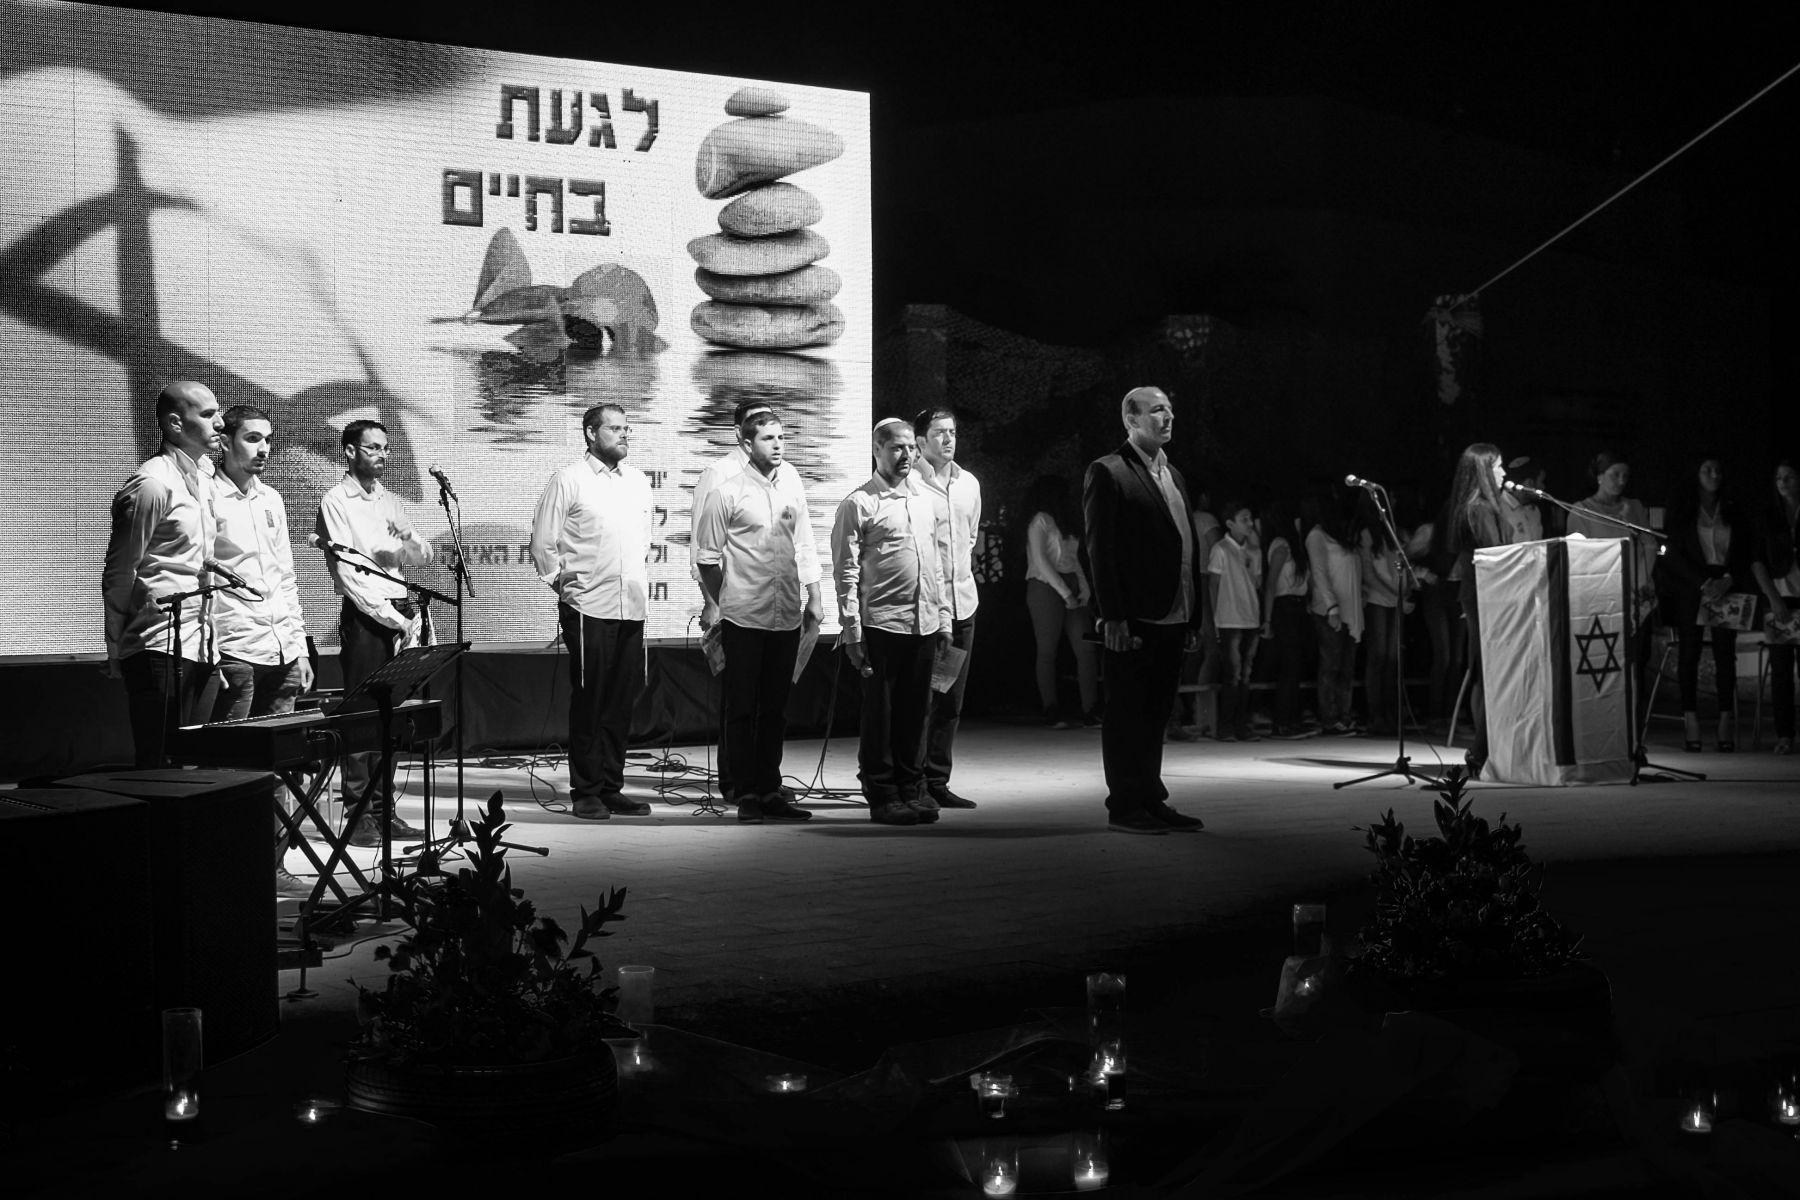 Ofakim, Israel 04/21/15